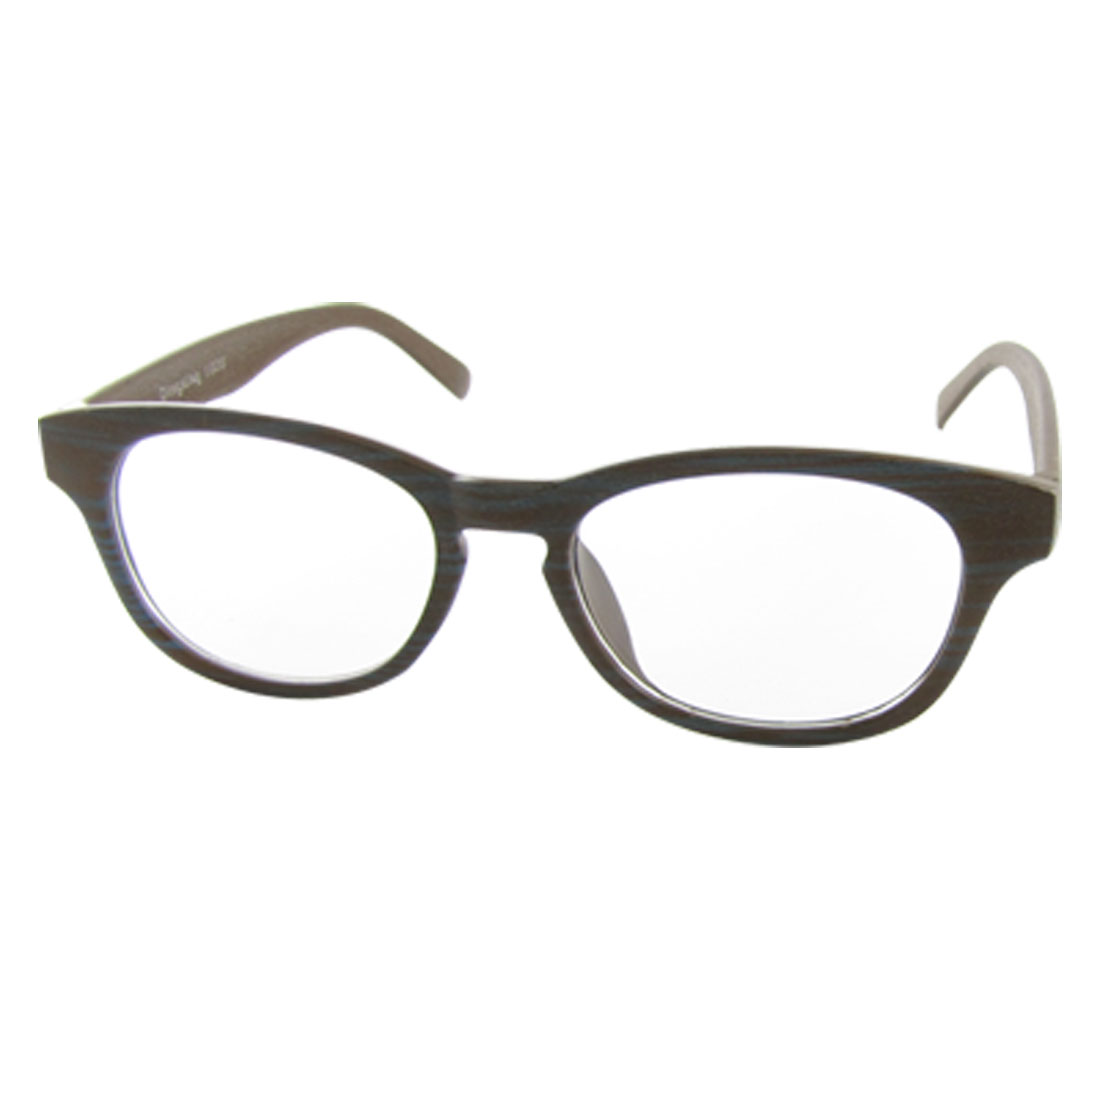 Wood Grain Plastic Full-rim UV Protection Sunglasses